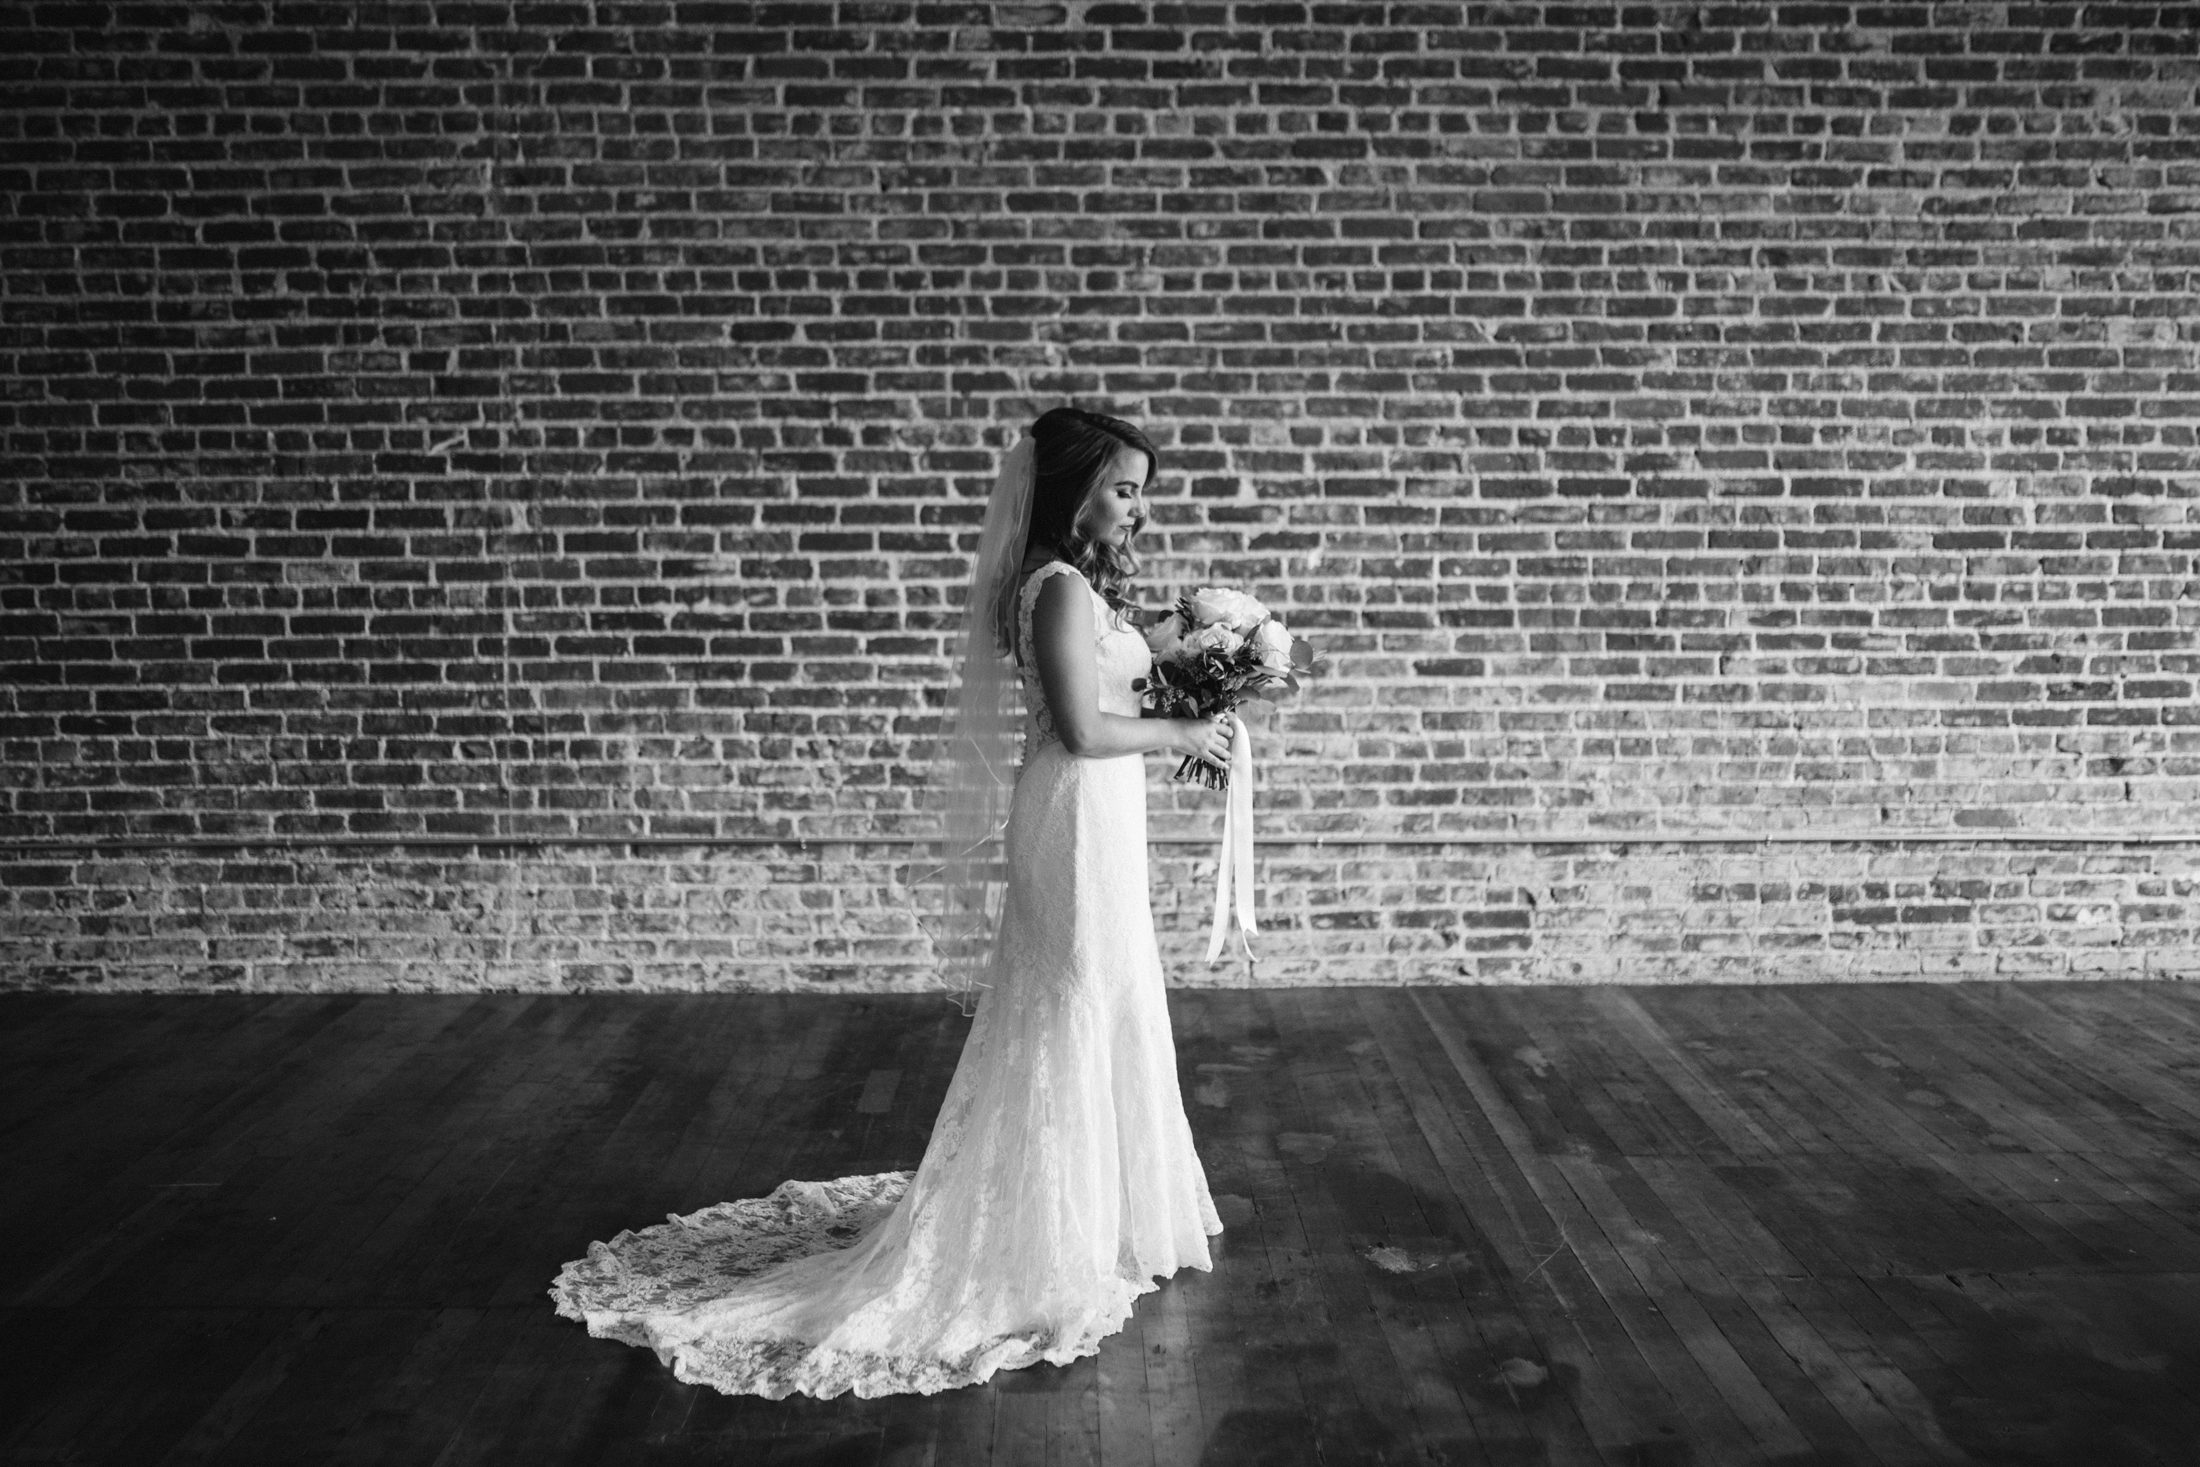 franciscan_garden_wedding-10.jpg